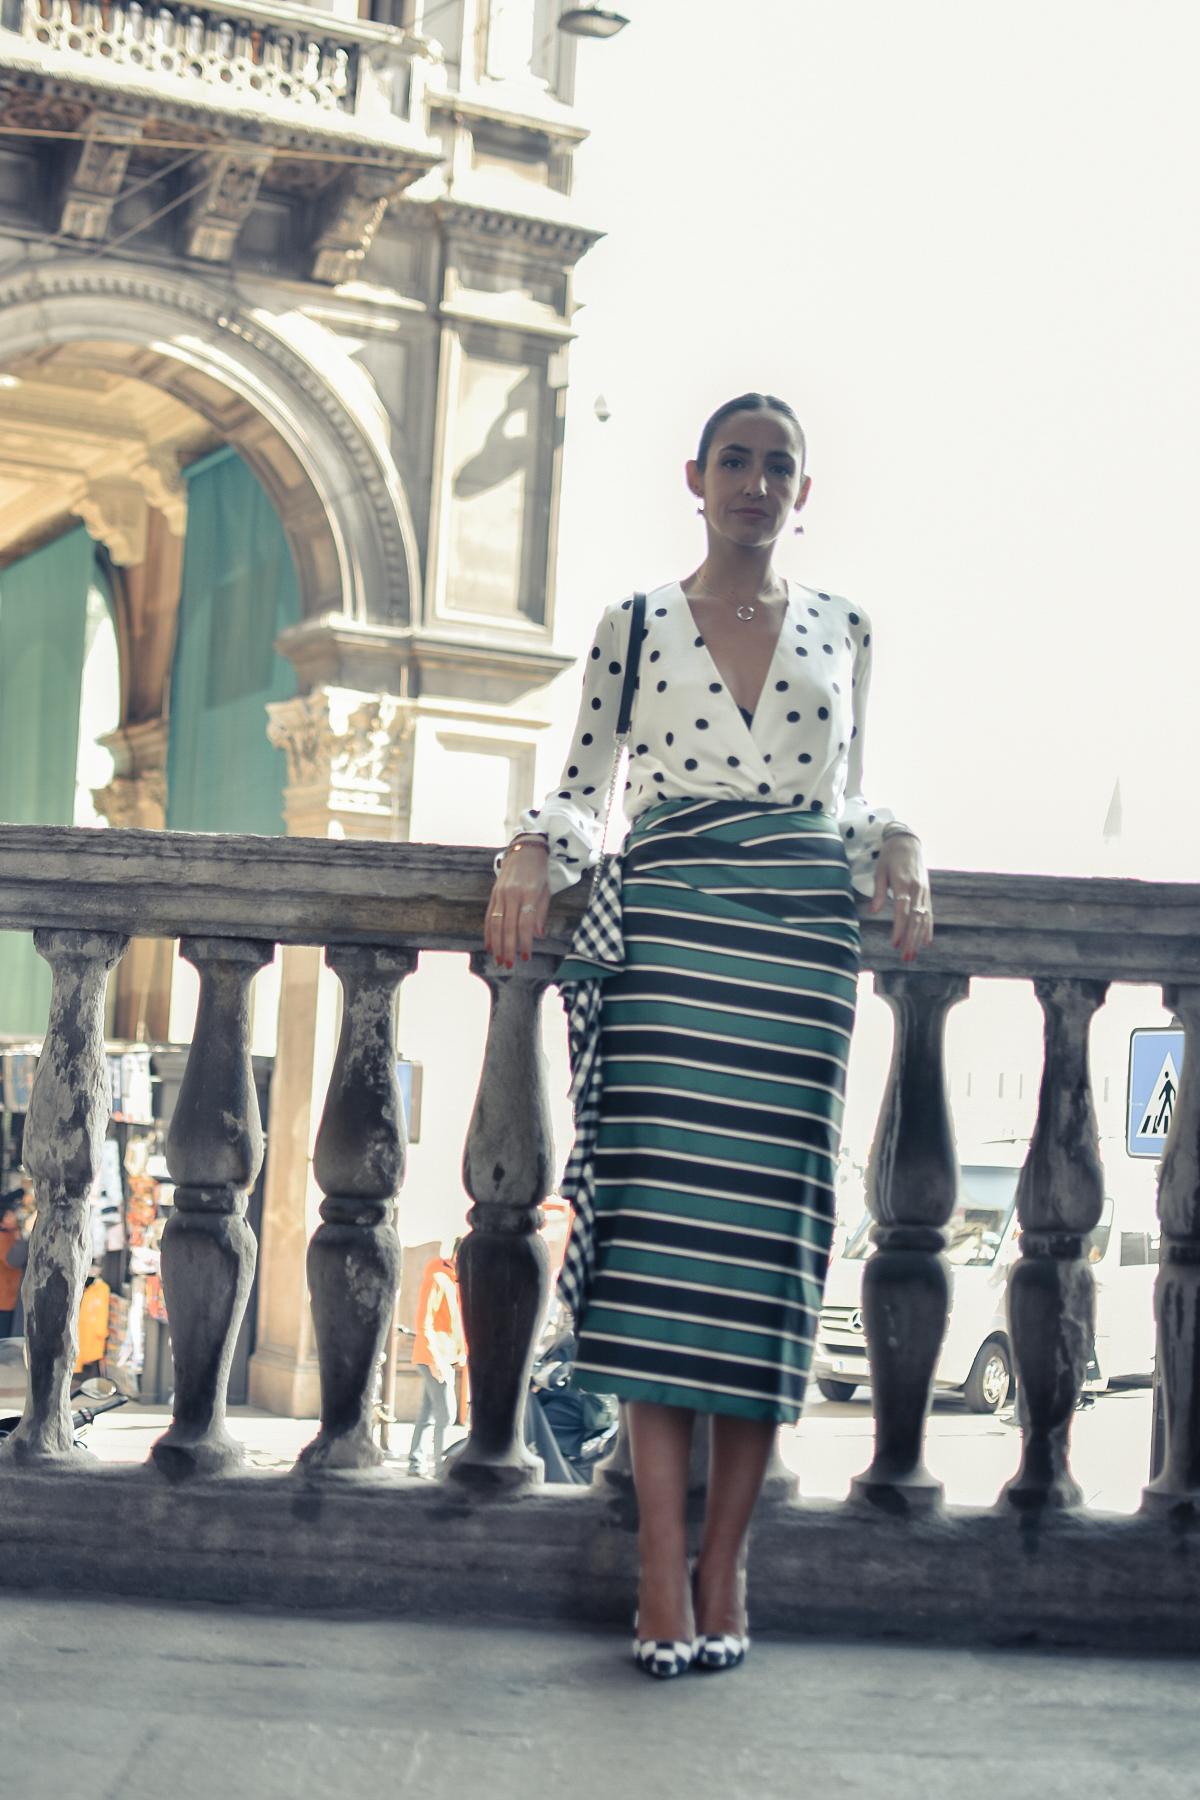 el-blog-de-silvia-mfw-milan-fashion-week-street-style-falda-rayas-manolo-blahnik-03